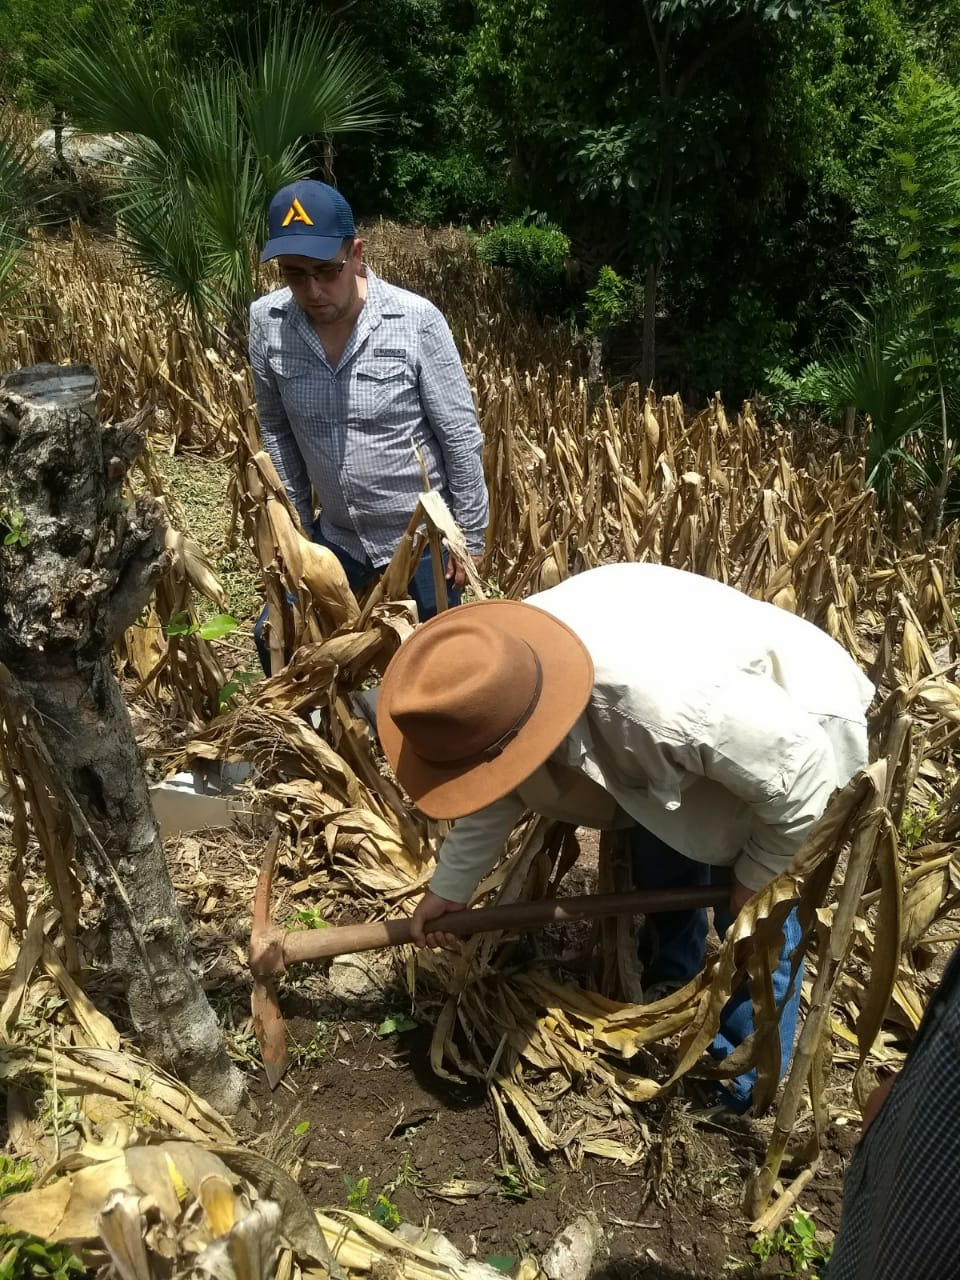 guatemala missione mani tese 2019 (1)